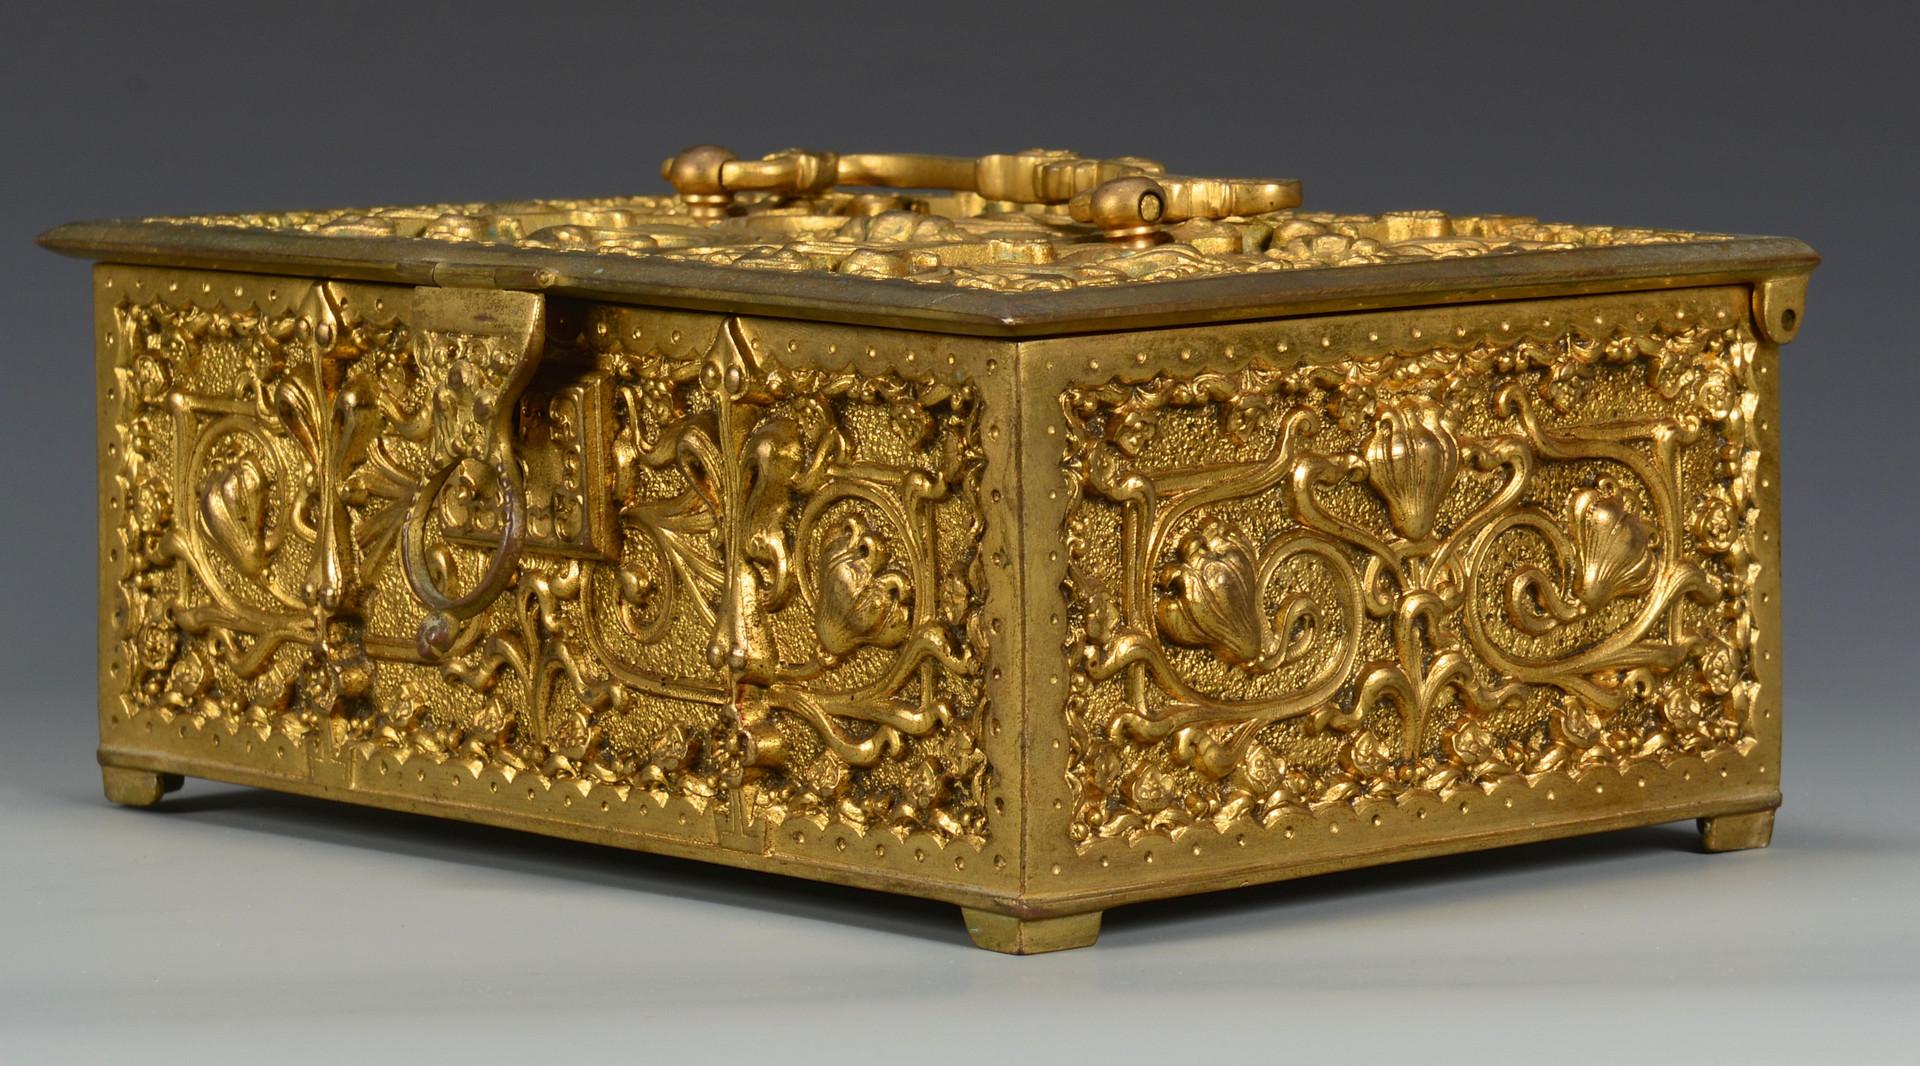 Lot 26: Erhard & Sohne Jewelry Box